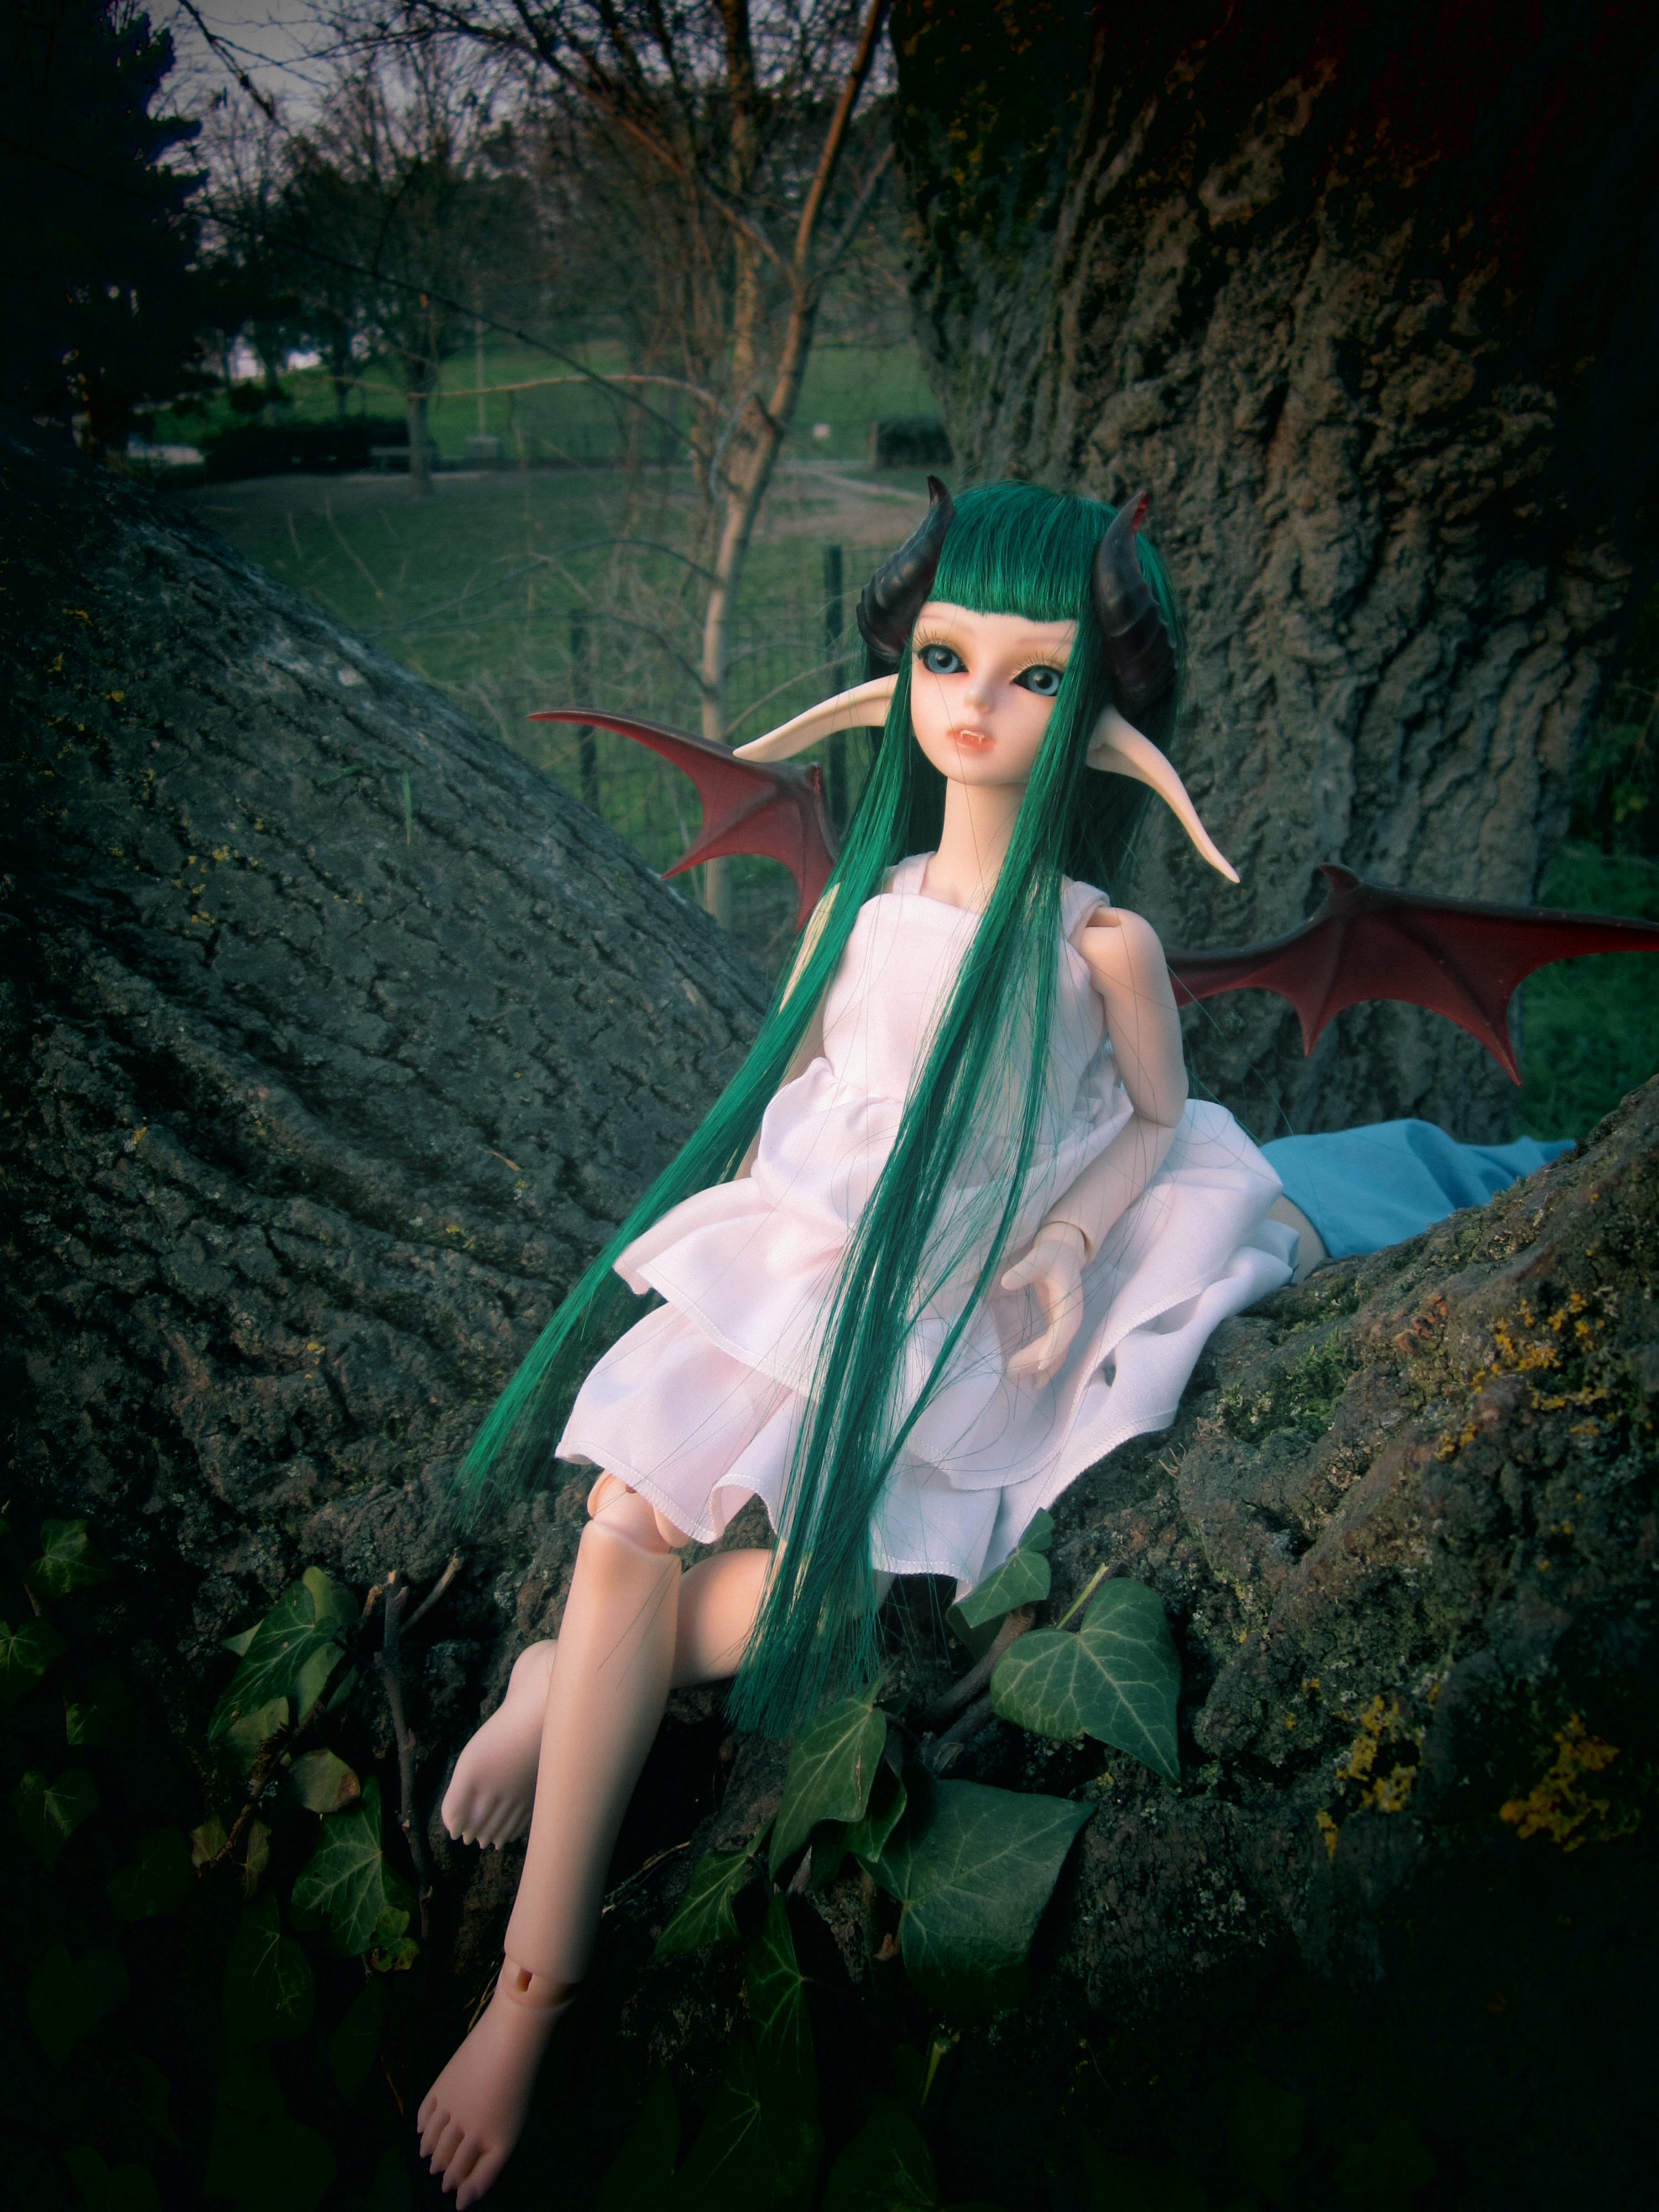 L'auberge C&C. [Leeke, DOD, Fairyland, Soom, AngellStudio] G573Ec